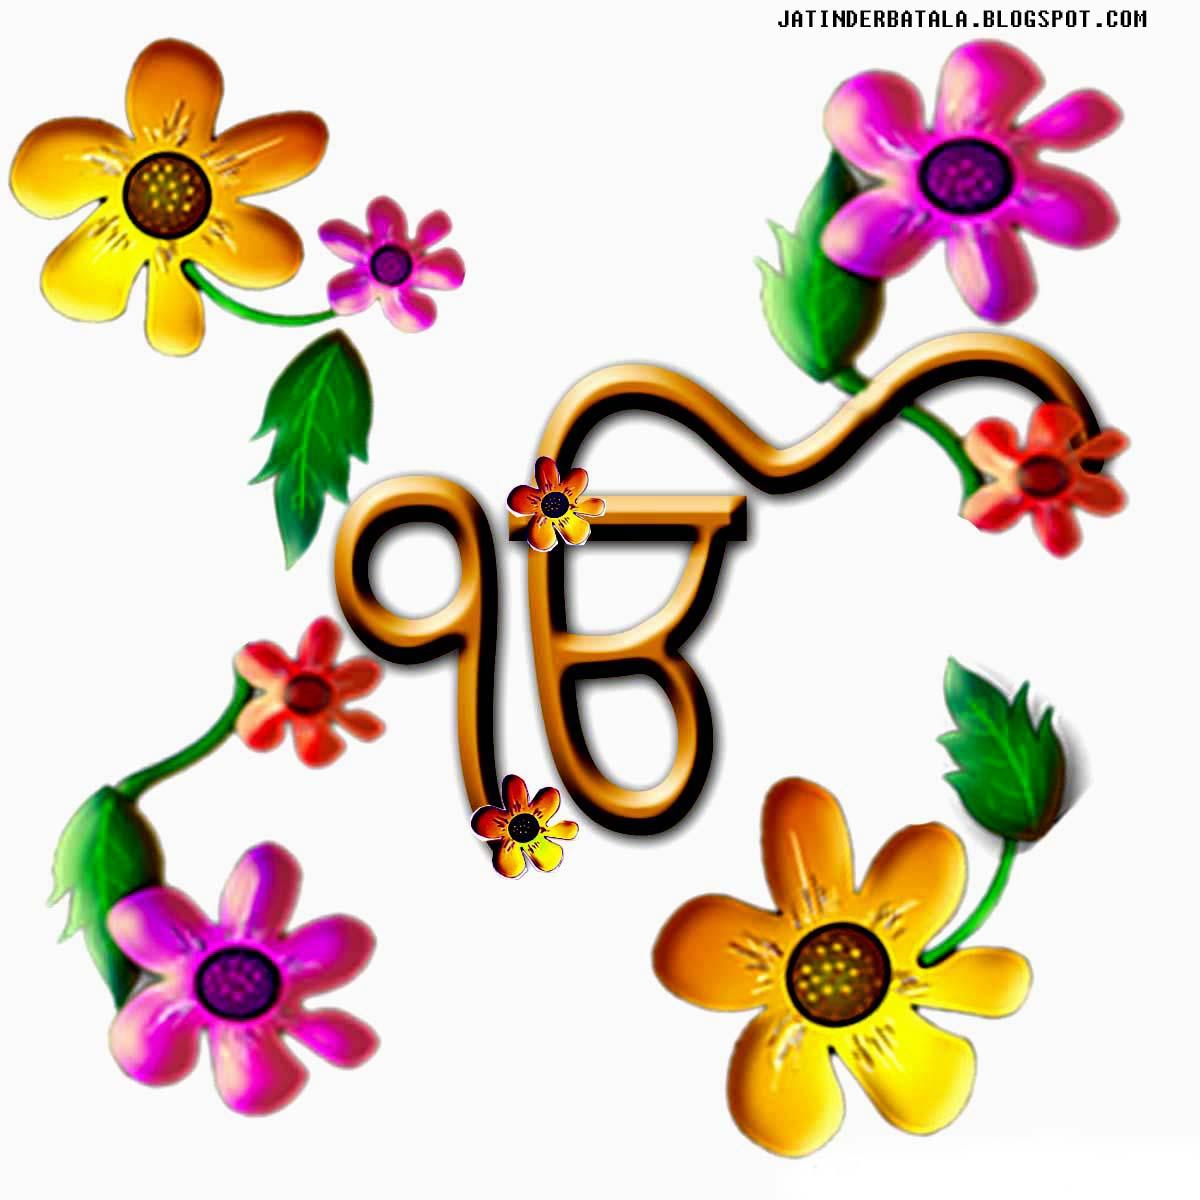 http://2.bp.blogspot.com/_cxwFrZ3mdy4/TNfSxCAELlI/AAAAAAAAAUg/hkXsrMjcu5Q/s1600/flower+ik+onkar+copy.jpg